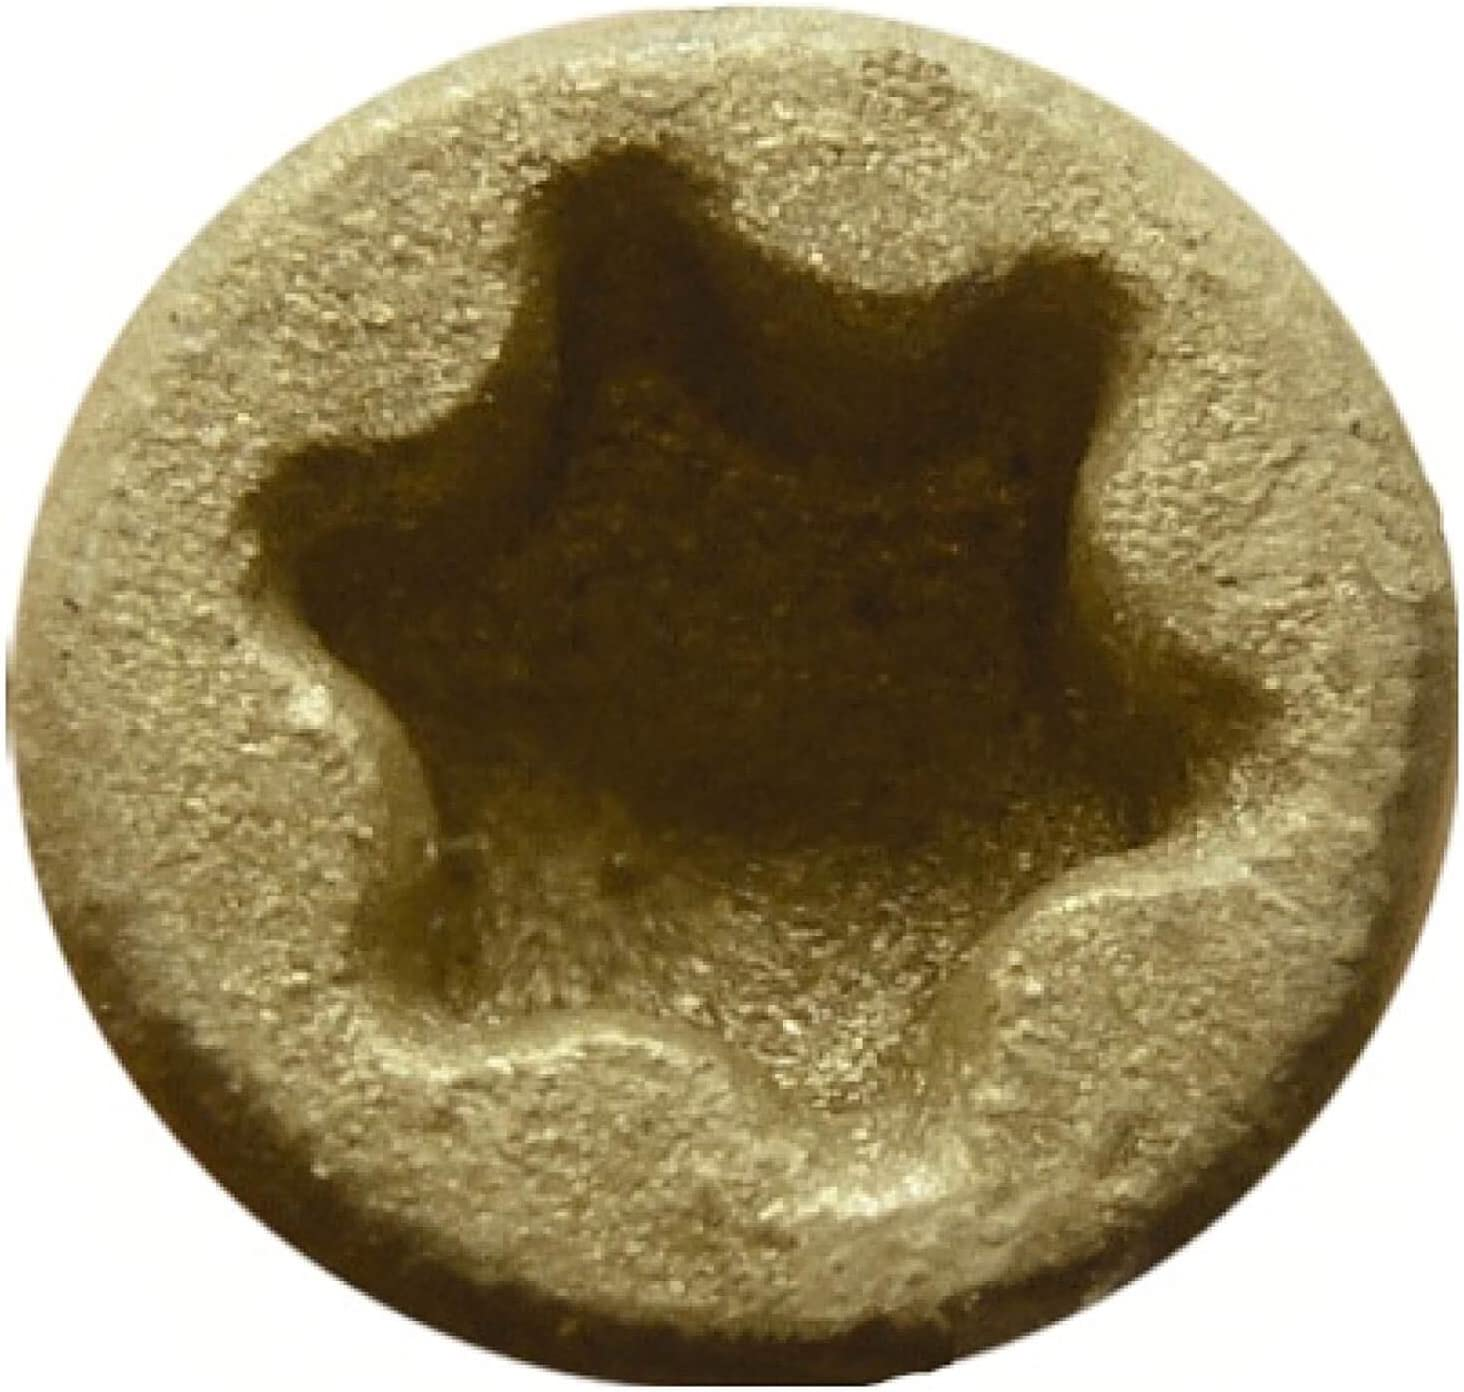 1 Pound - 187 APX. Screws Finish Head Exterior Coated Torx//Star Drive Wood Screws #7 x 2 Bronze Star Exterior CoatedTiny Finish Head Wood Screw Torx//Star Head Tiny Head Wood Screws